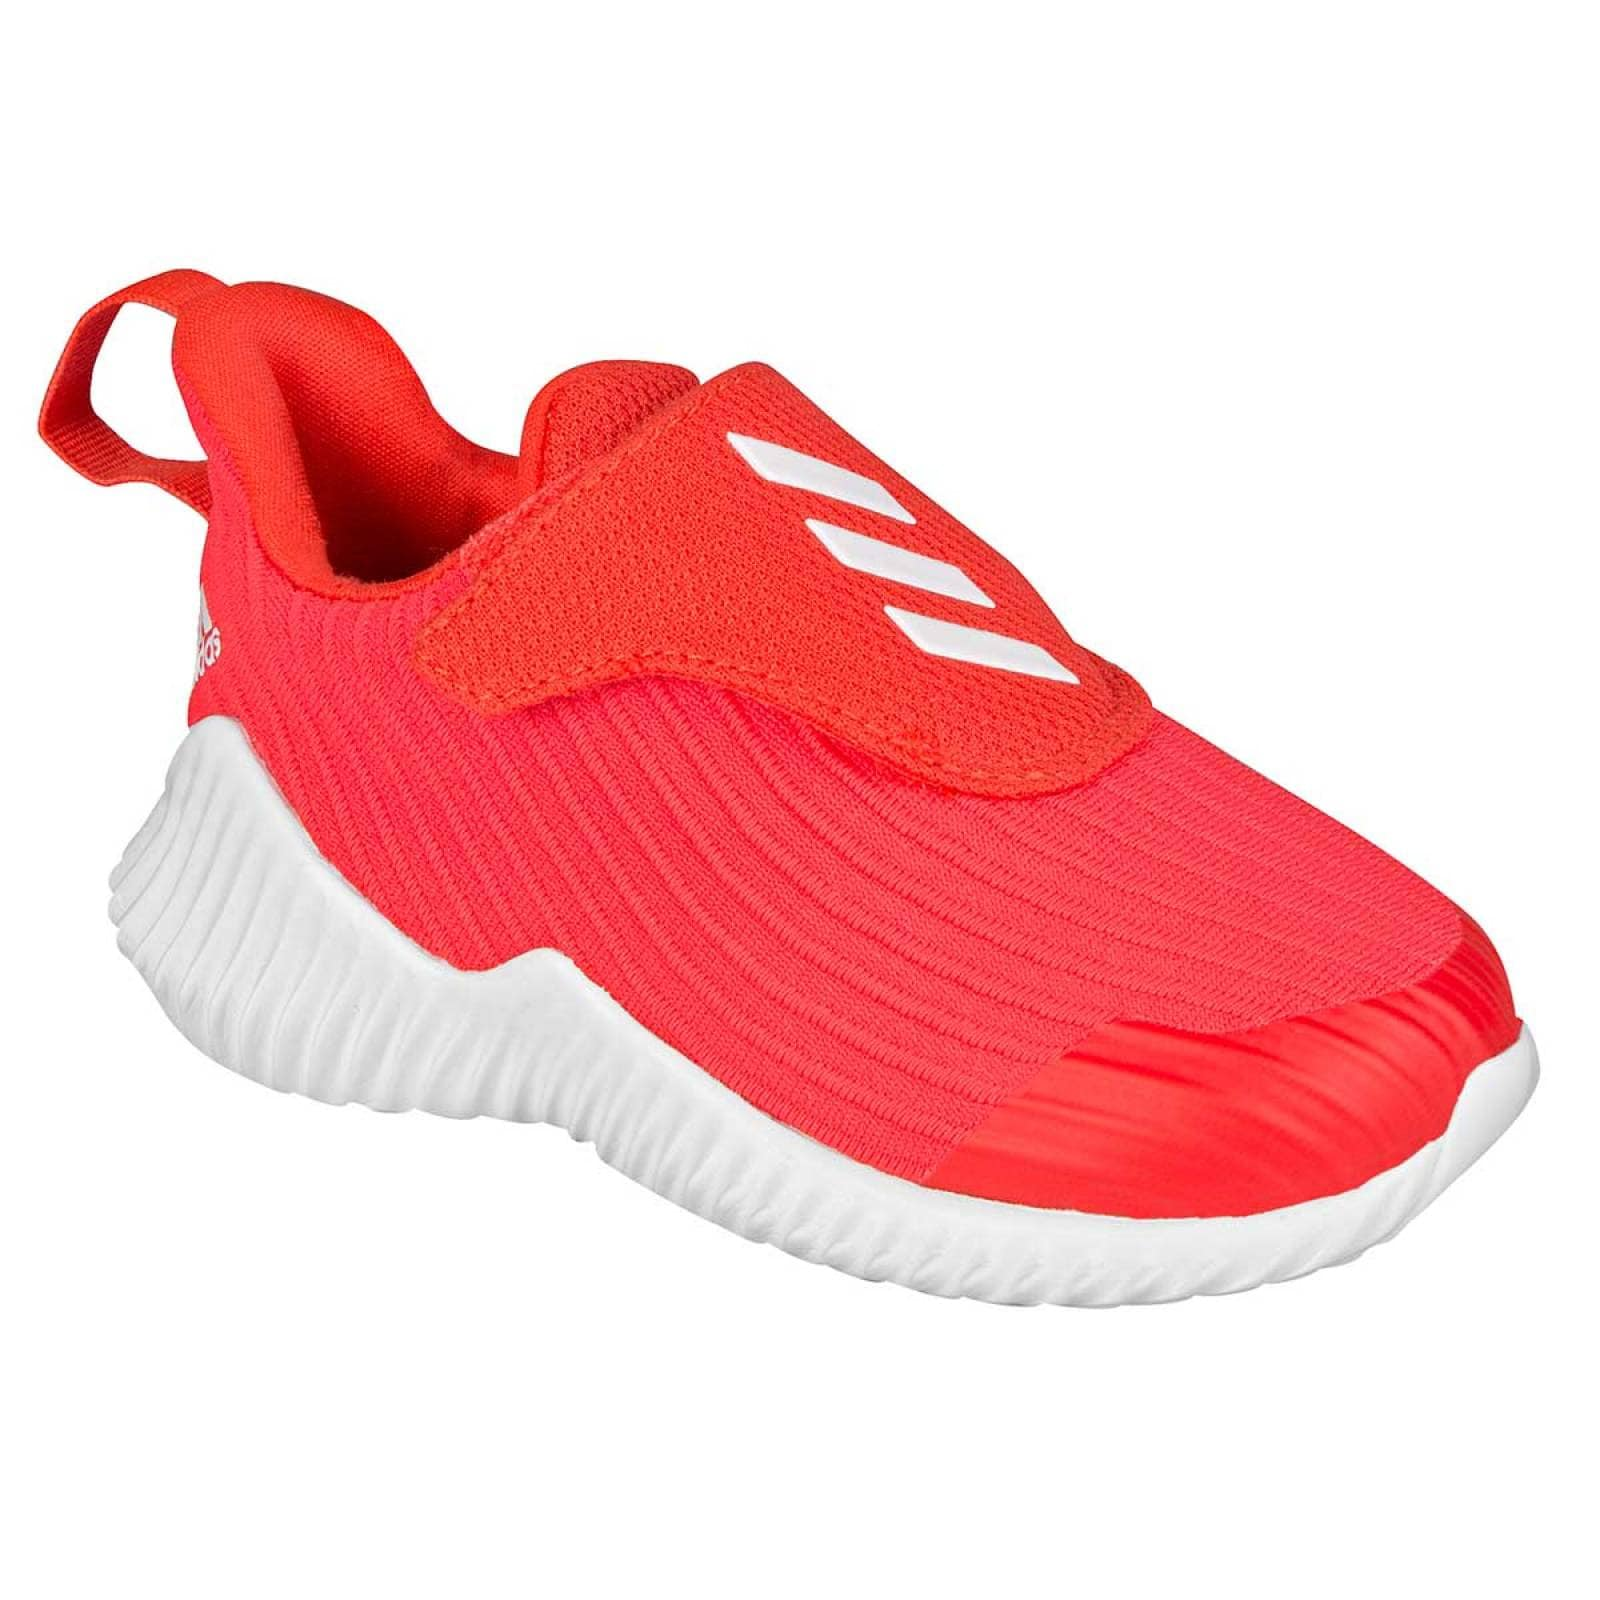 doble Hacer Asco  Adidas Tenis para Bebé Niño 88195-1